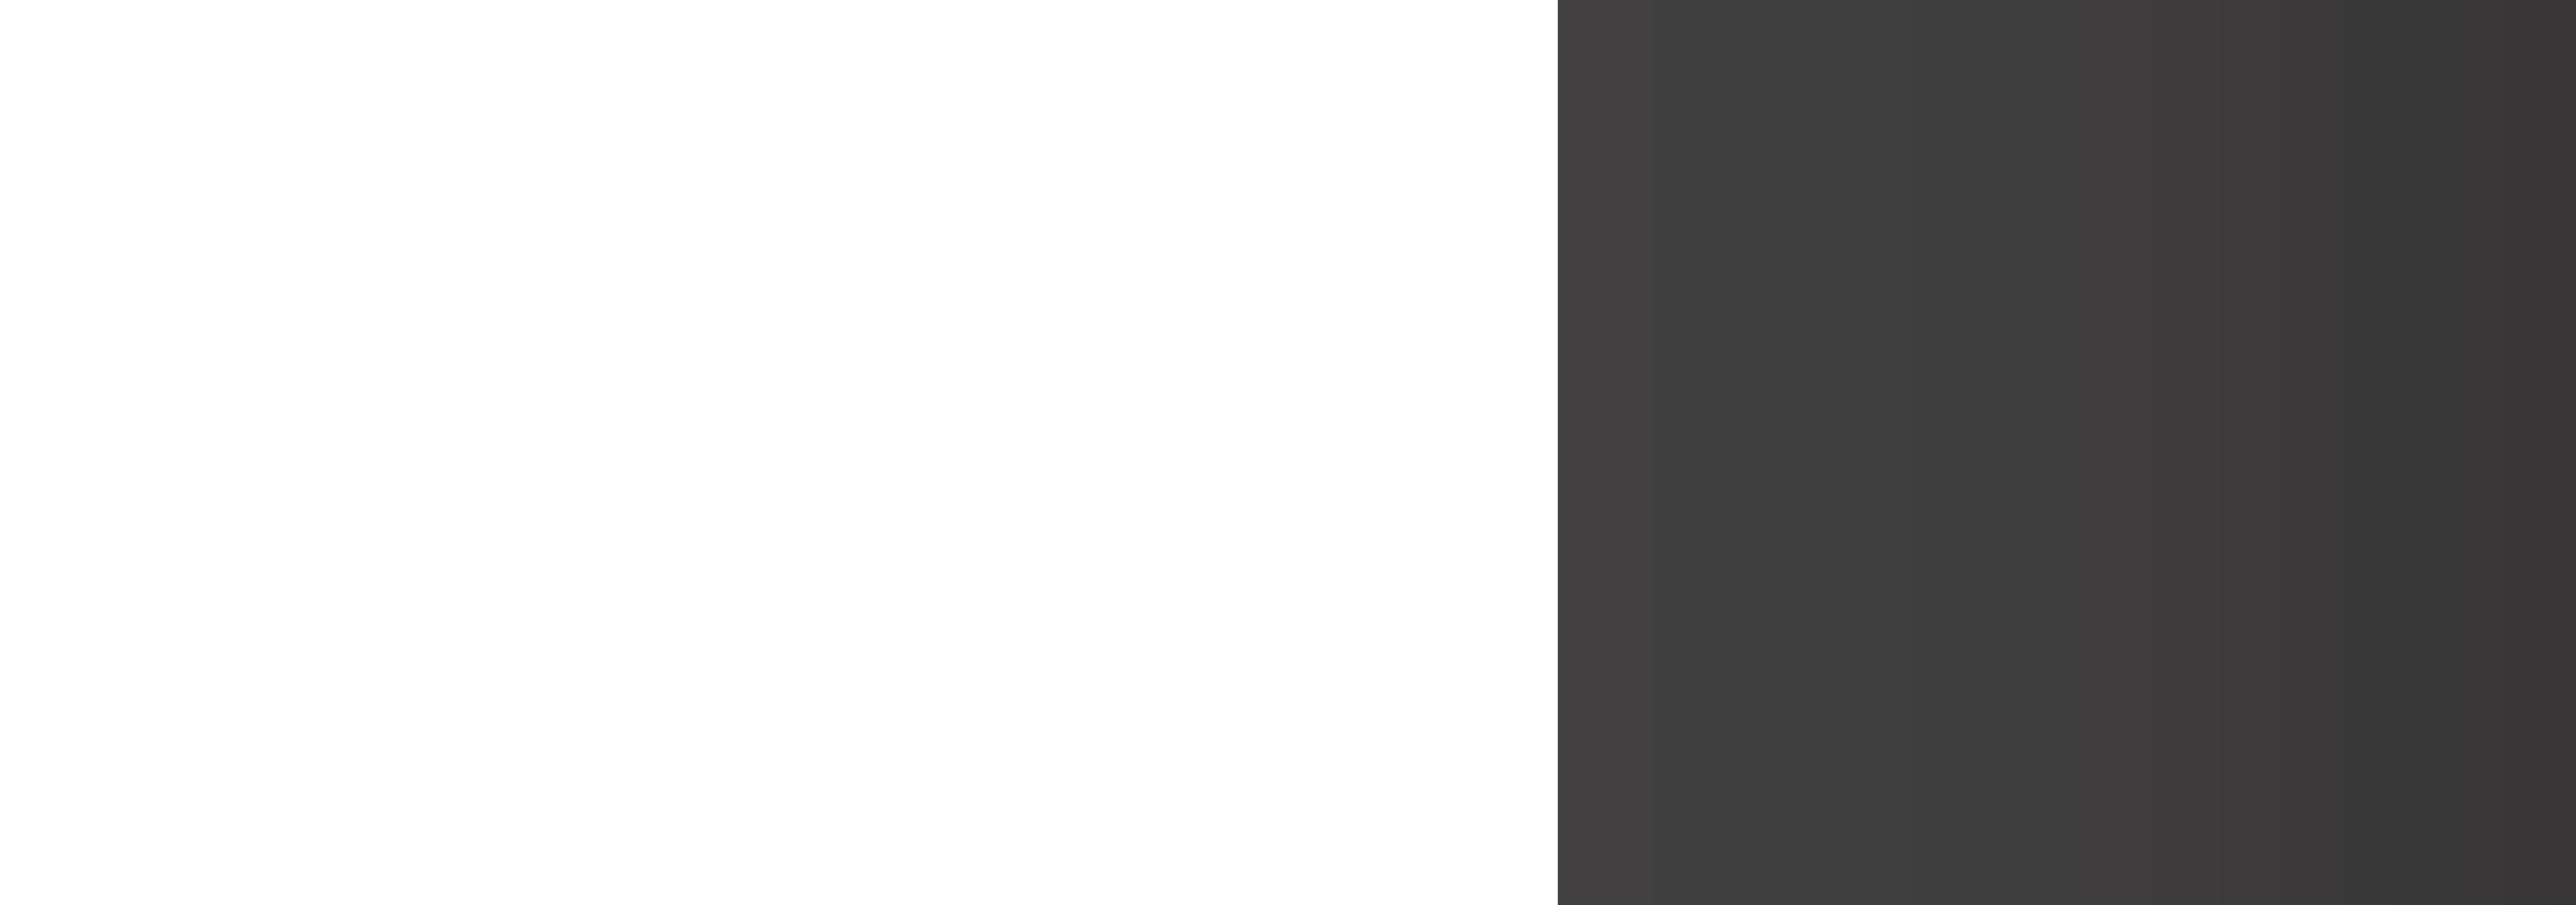 Banner-Black